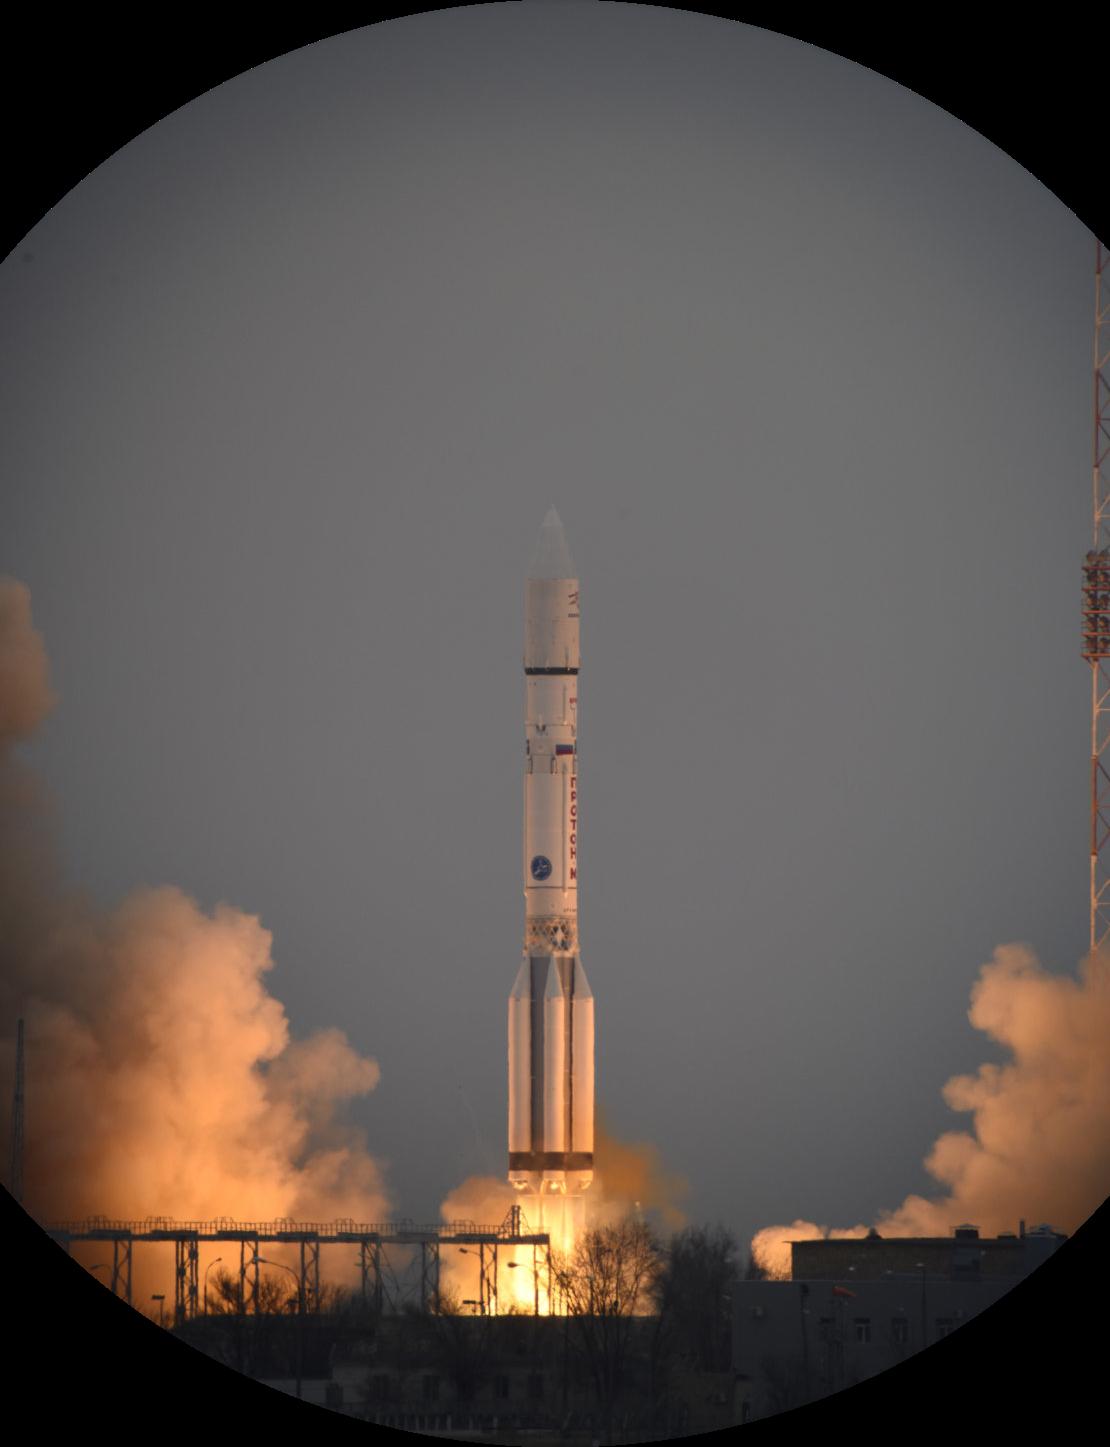 Photo Credit: ESA